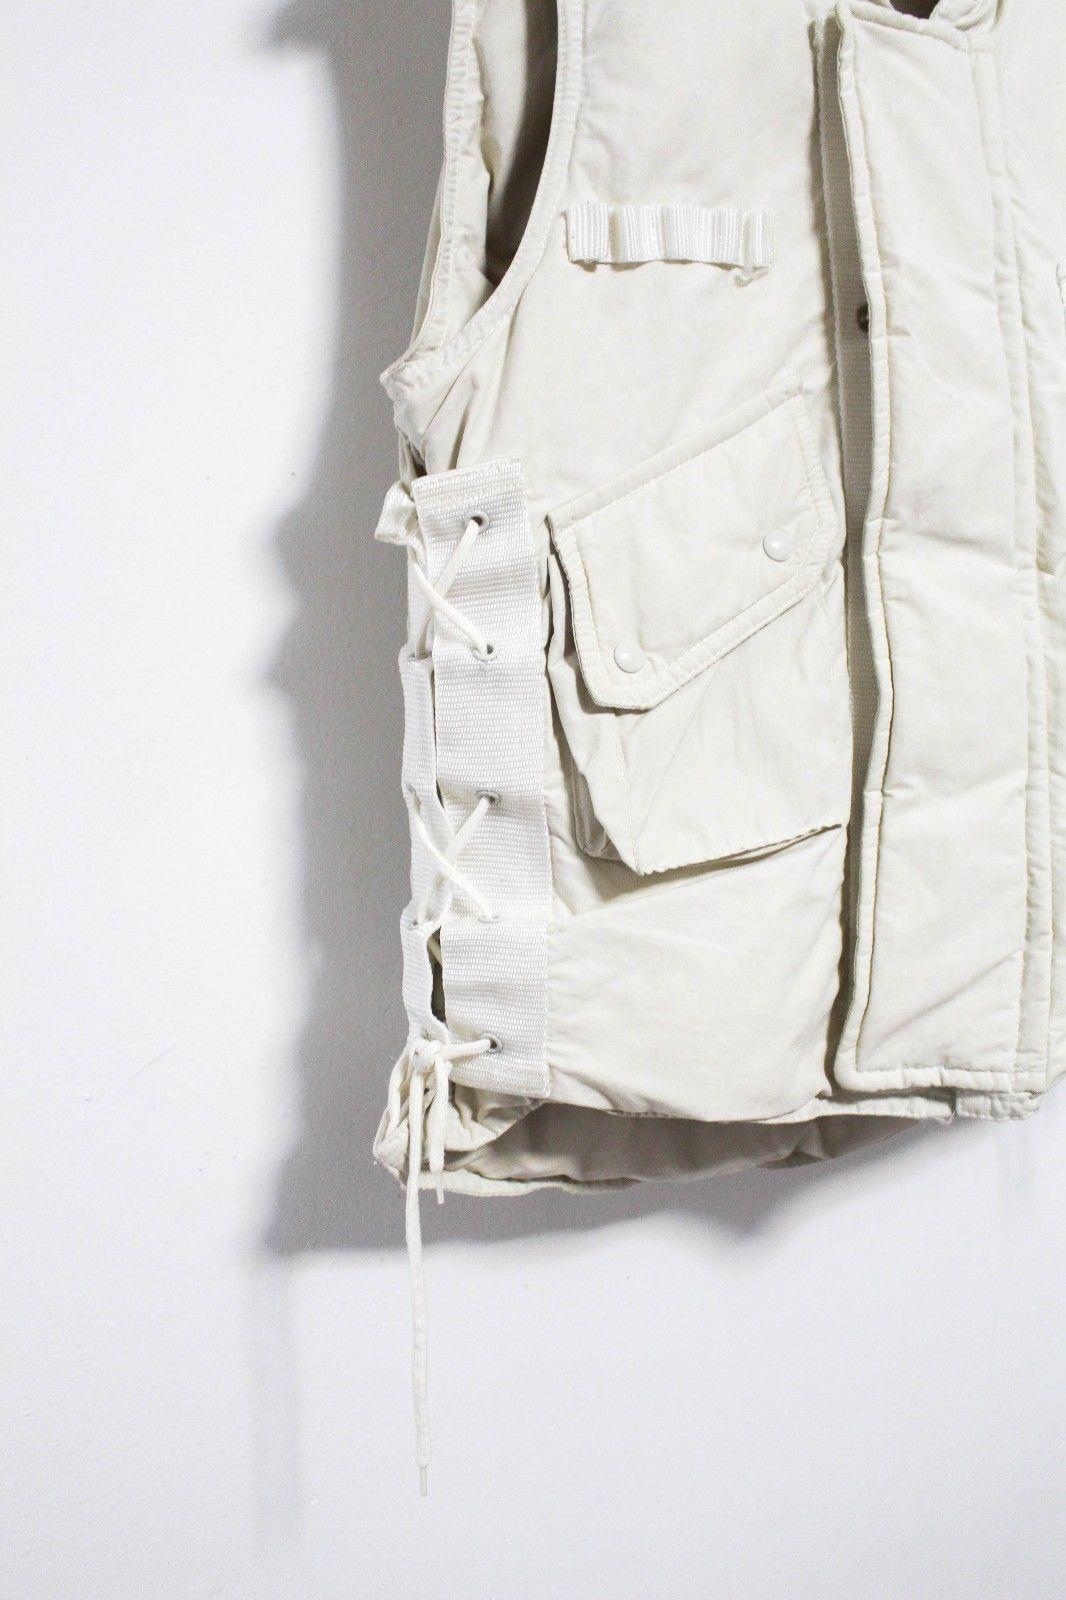 Helmut Lang Fw 1999 Vintage Archive Goosedown Military Vest Jacket Ebay Womens Fashion Vintage Helmut Lang Military Vest